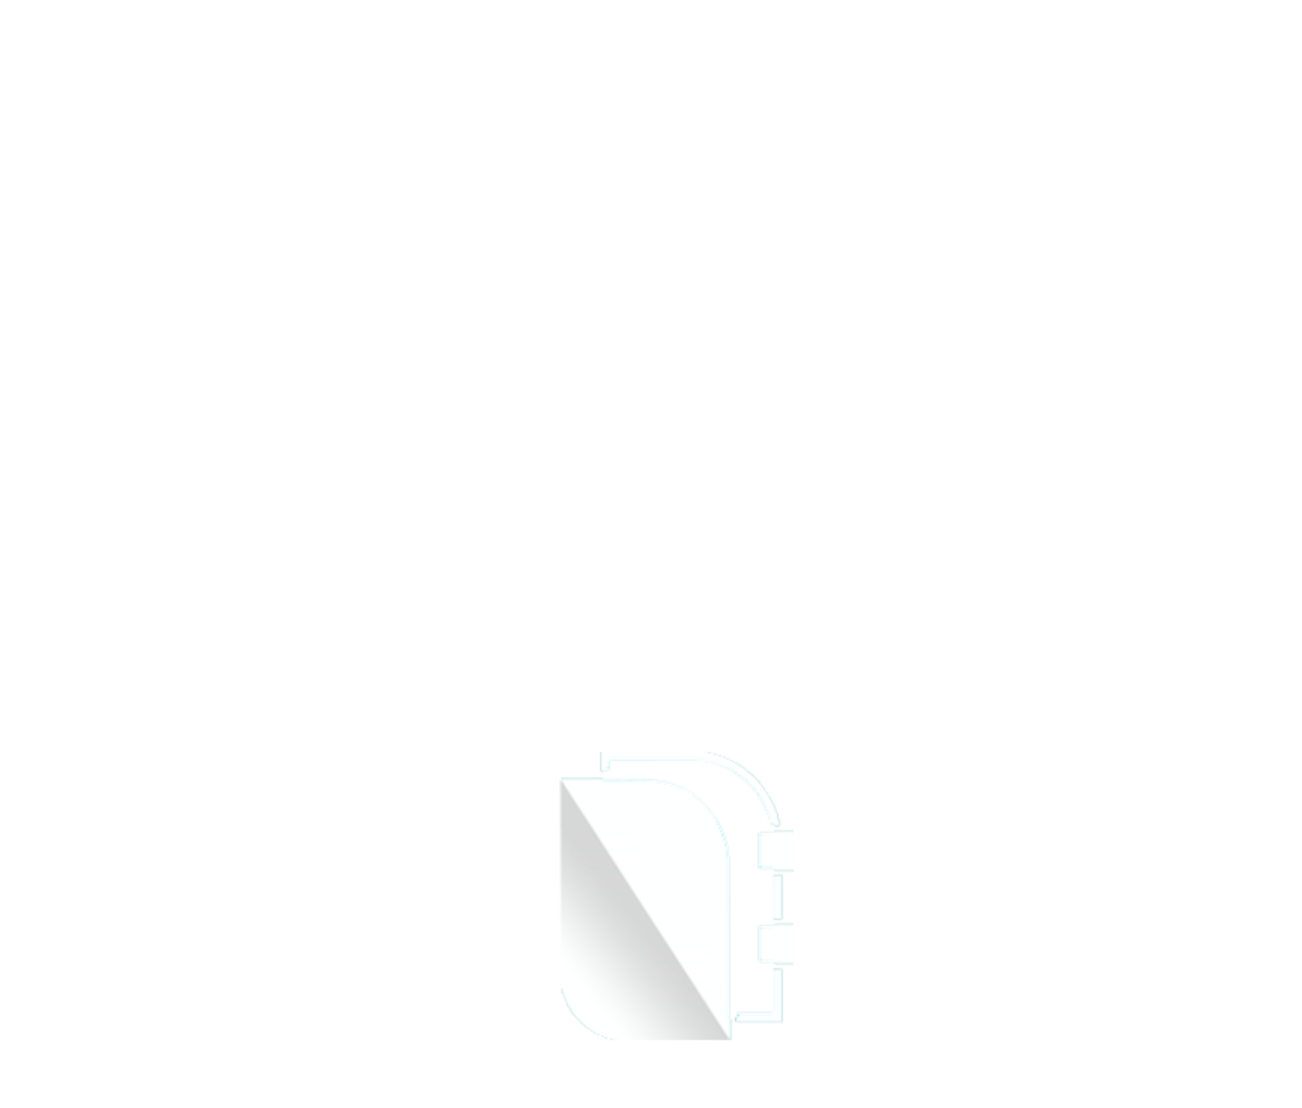 salesforce sb replicator graphic 2